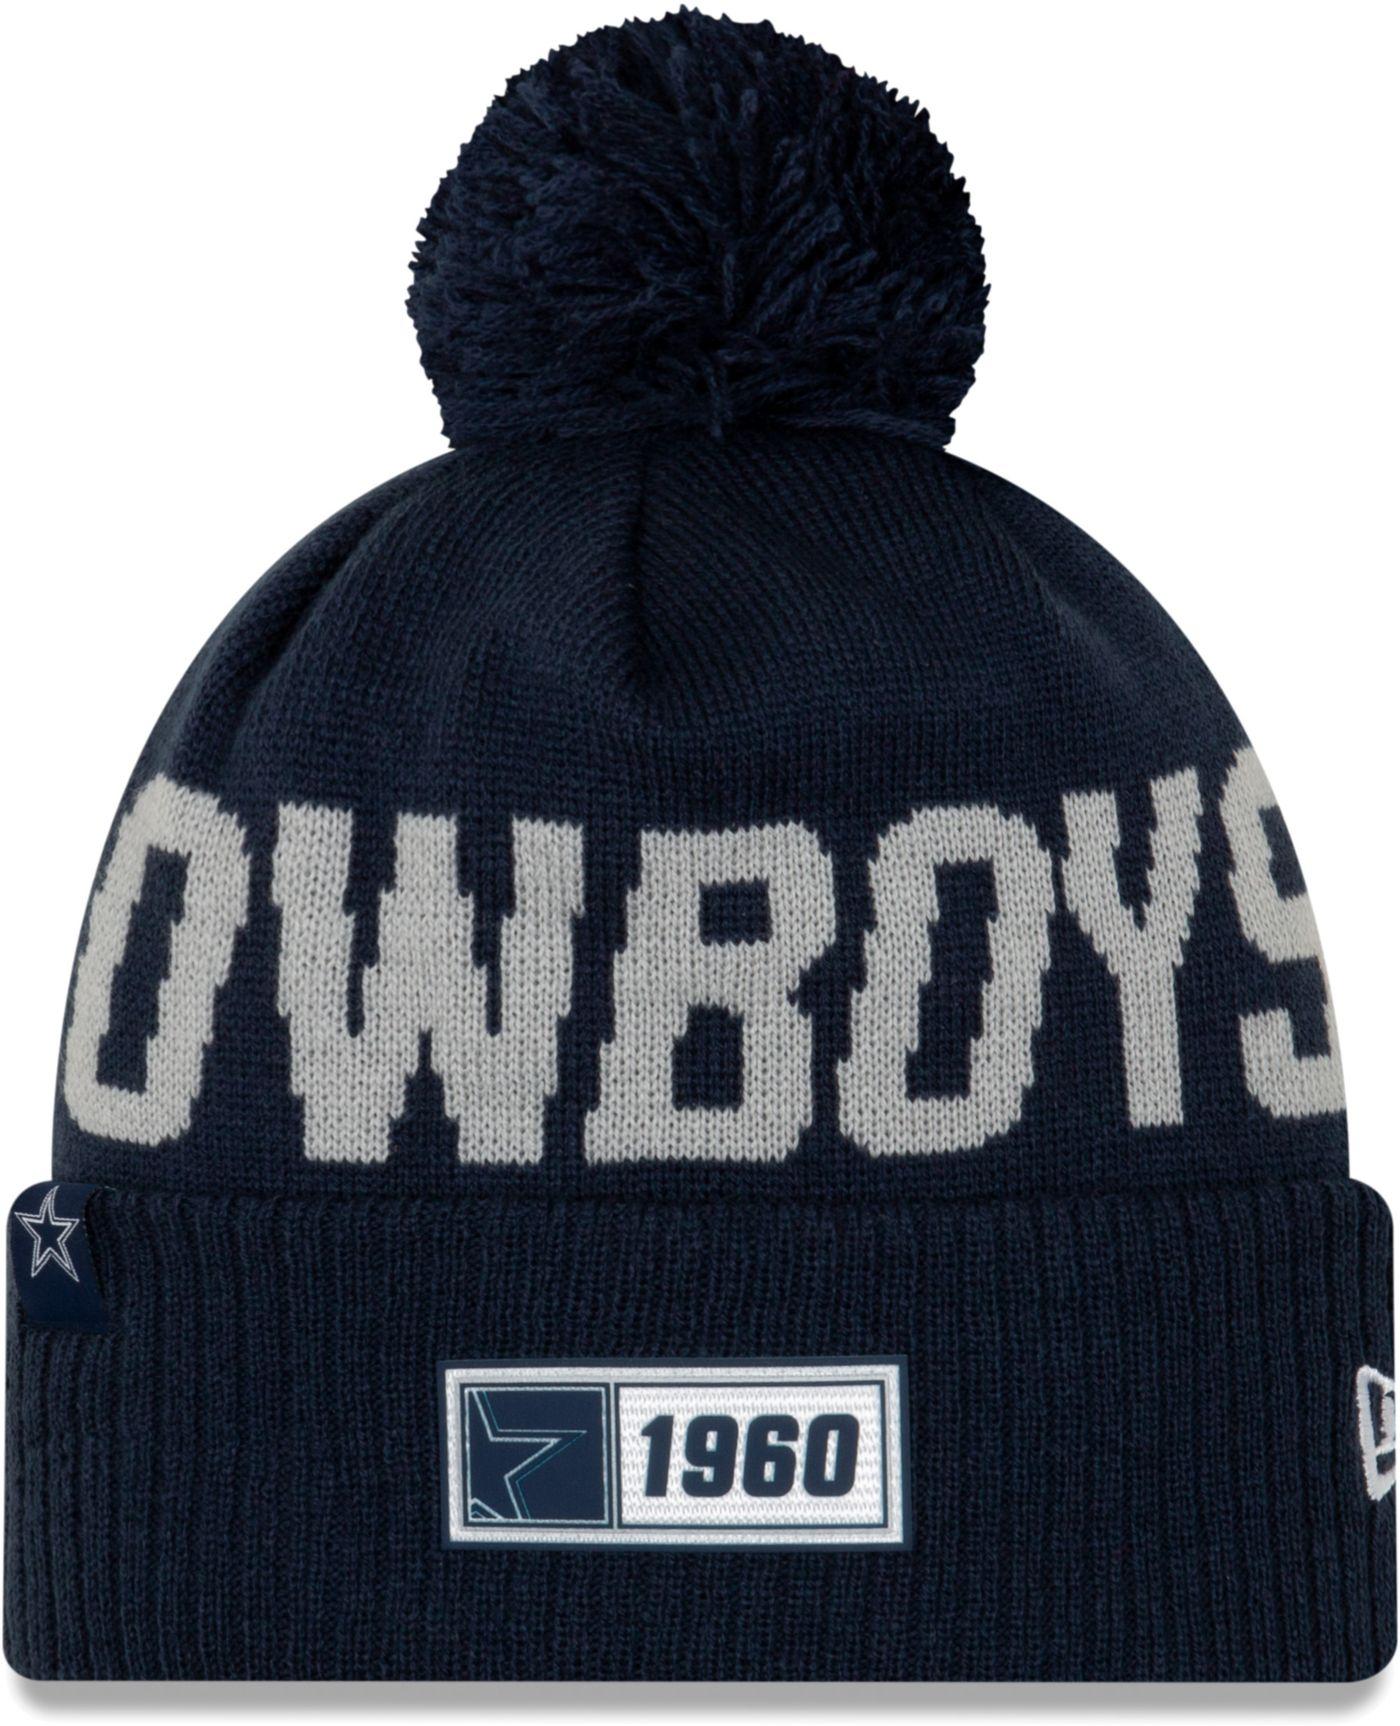 New Era Men's Dallas Cowboys Sideline Road Sport Pom Knit